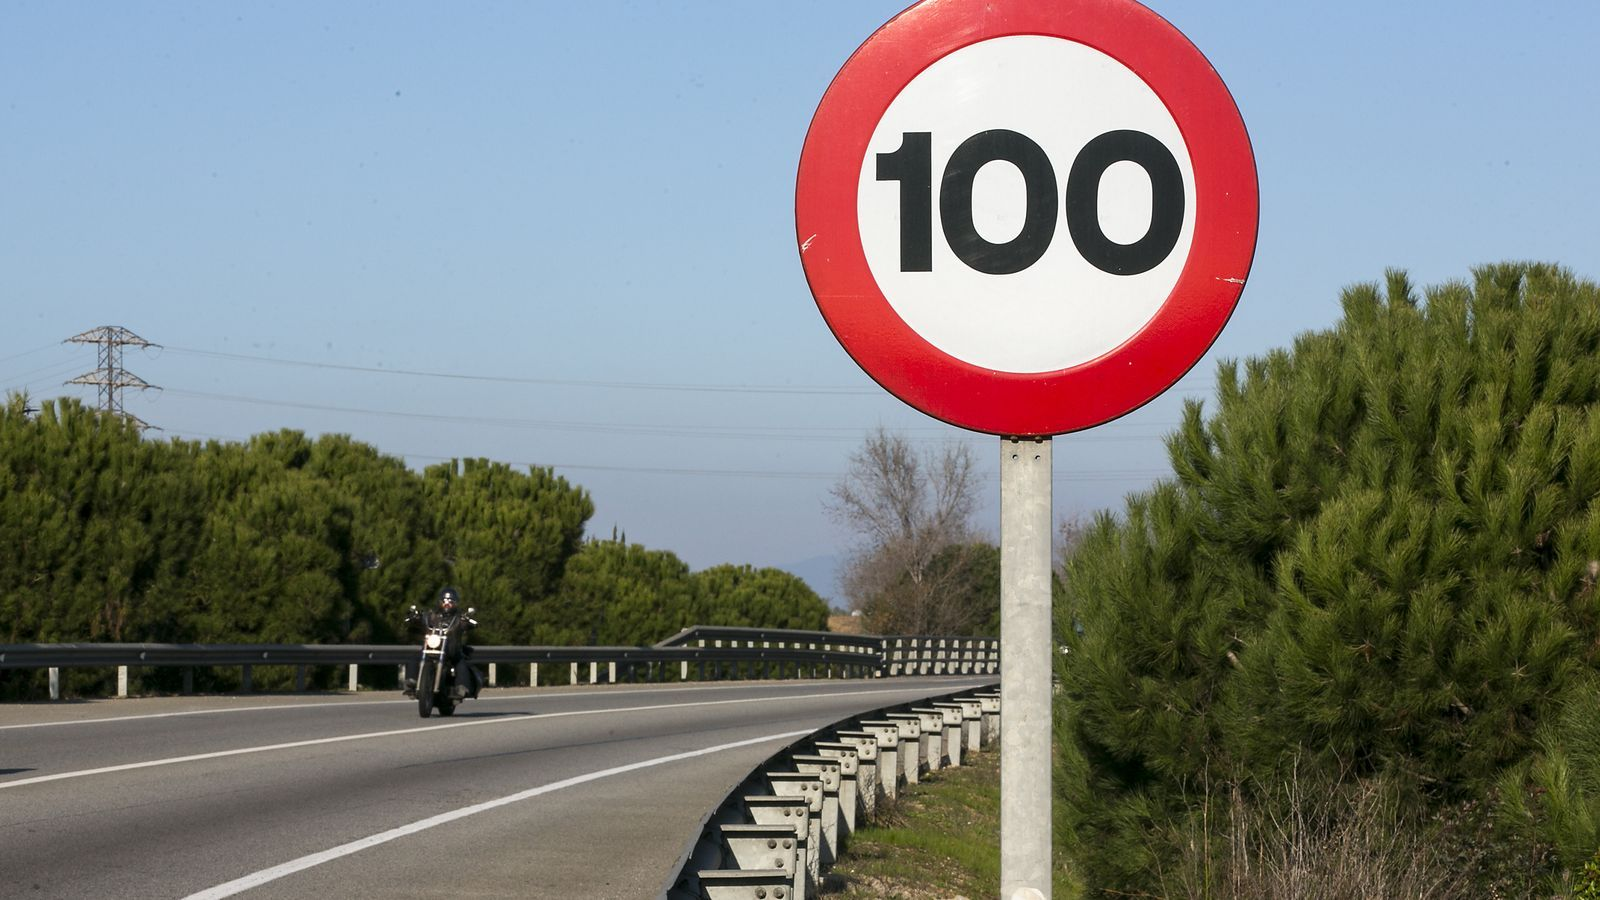 unglaubliche Preise moderate Kosten neues Design La velocitat a les carreteres secundàries baixarà a 90 km/h ...